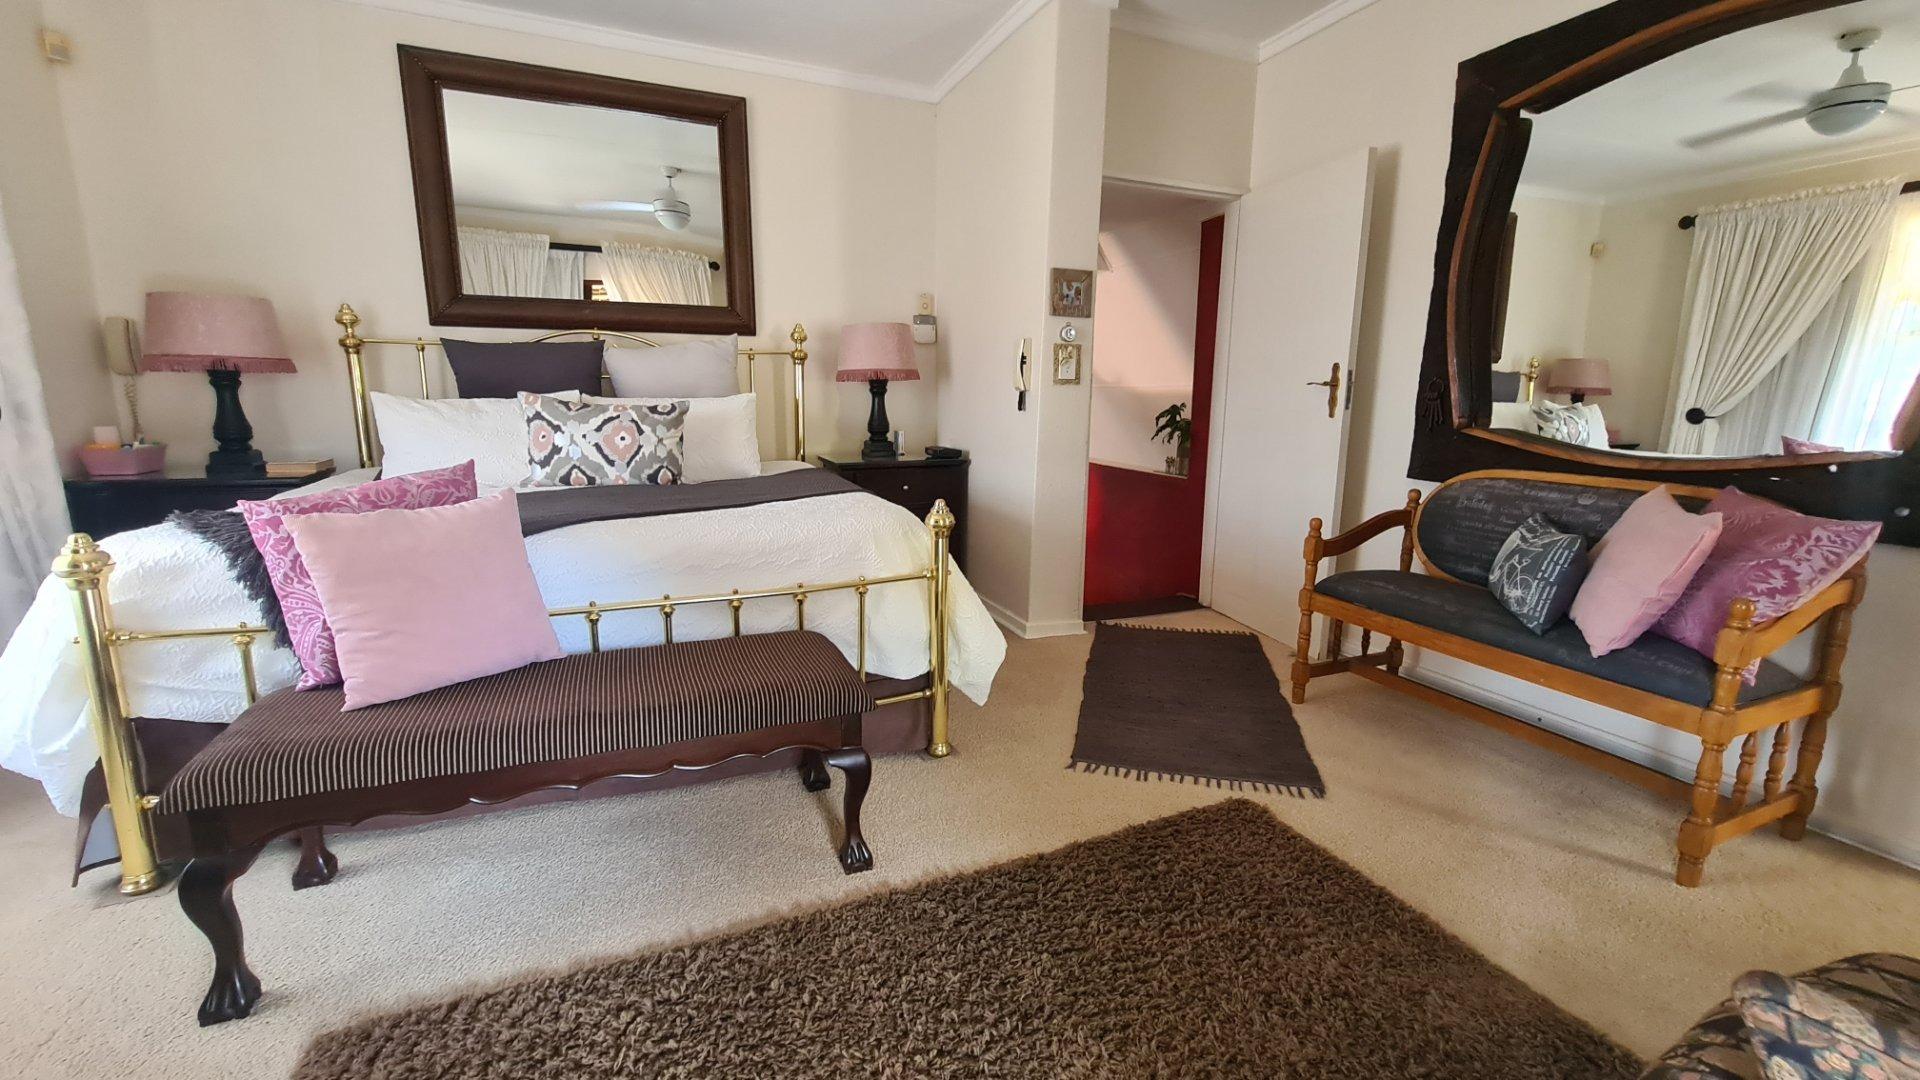 3 Bedroom Apartment / Flat For Sale in Kiepersol